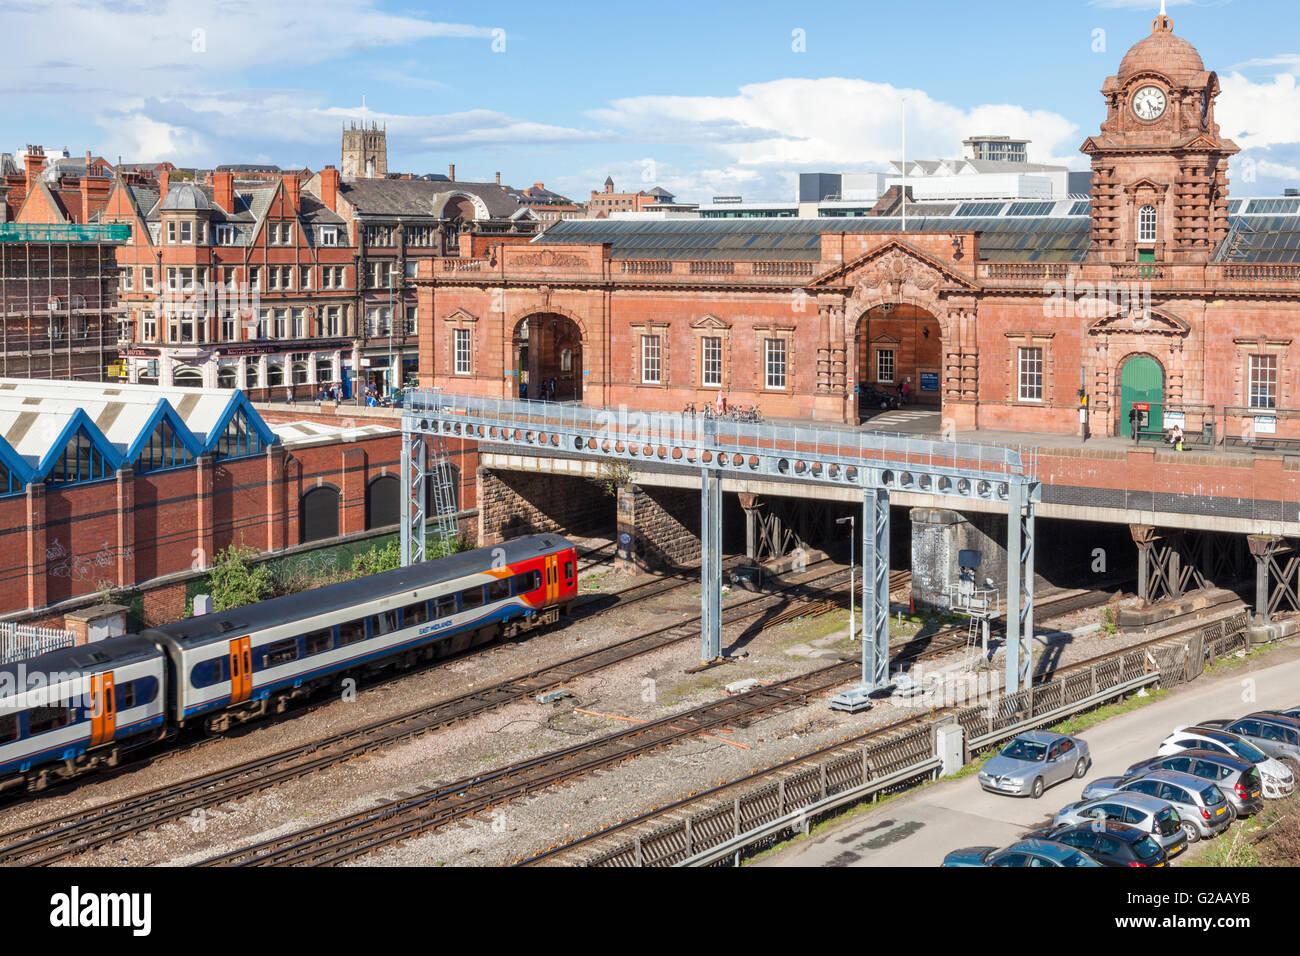 East Midlands Trains Leicester Car Park